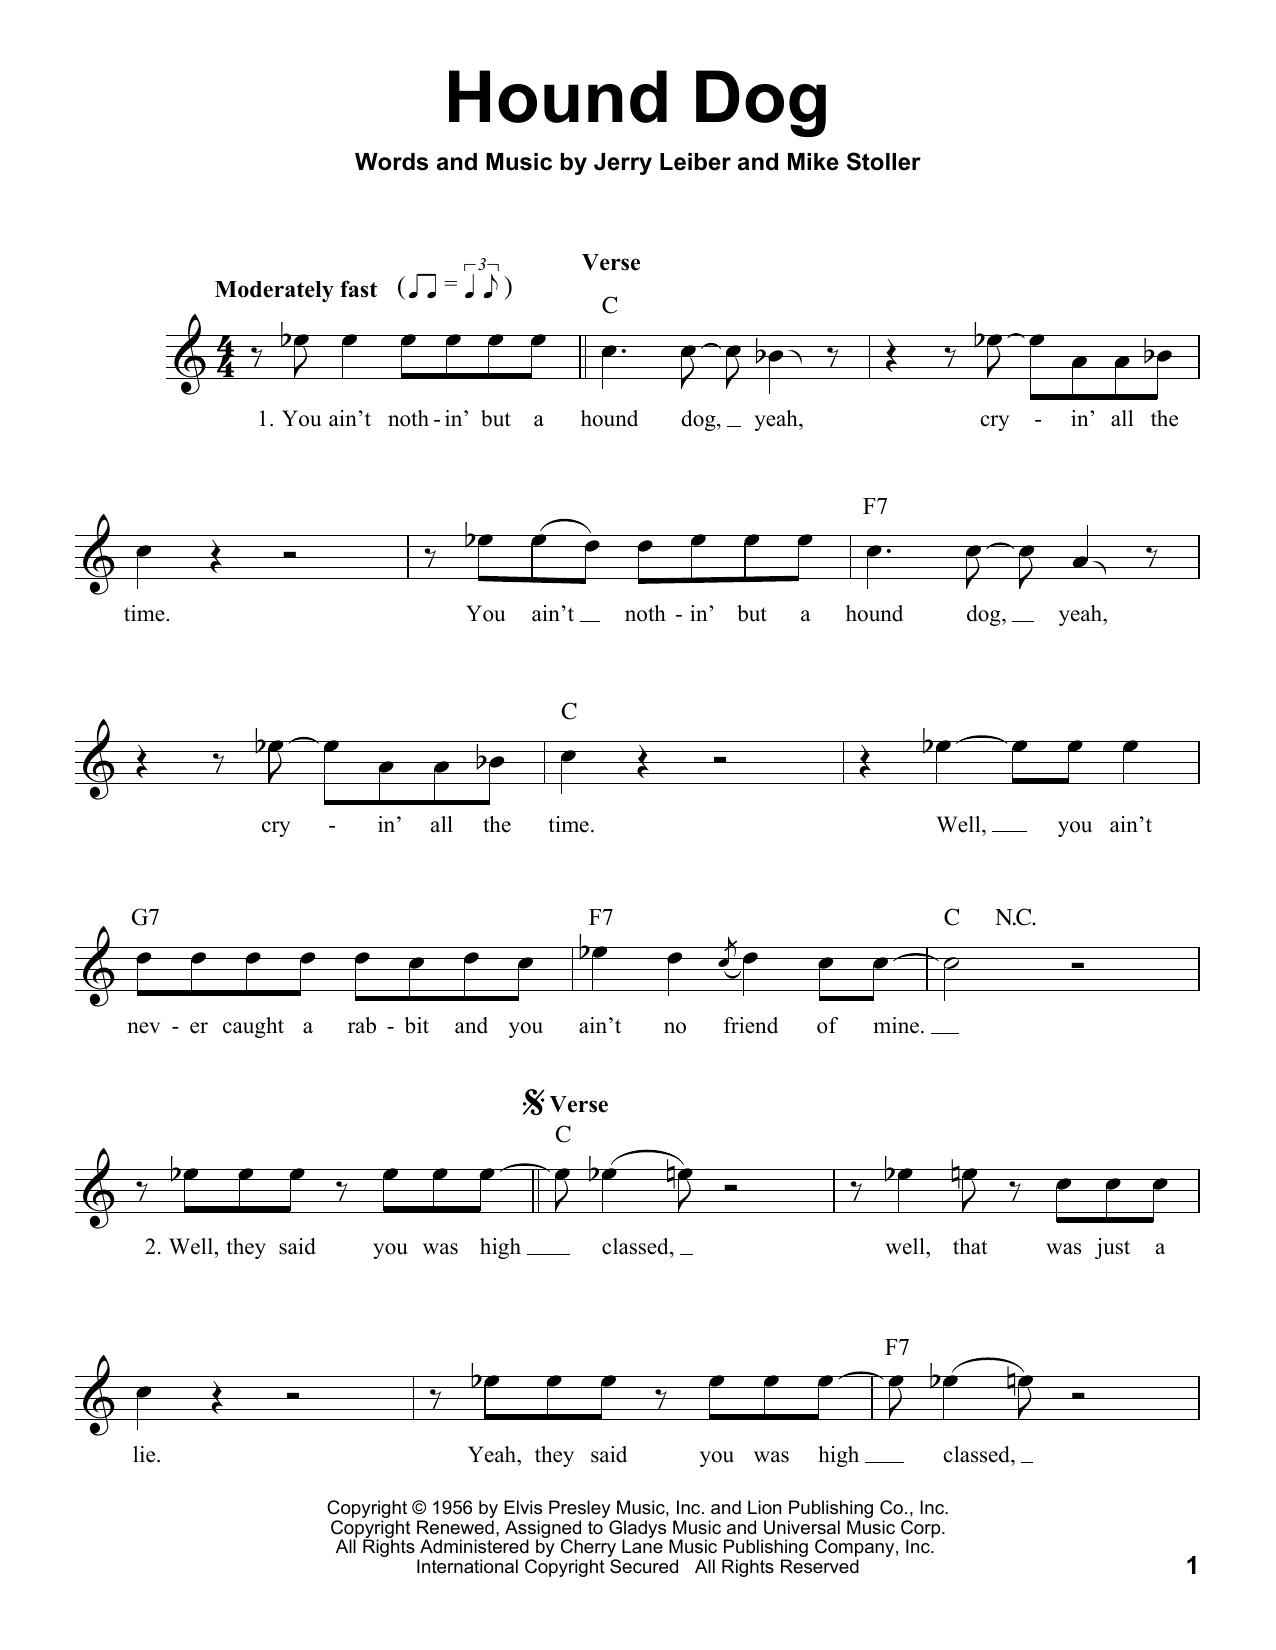 Hound Dog Print Sheet Music Now